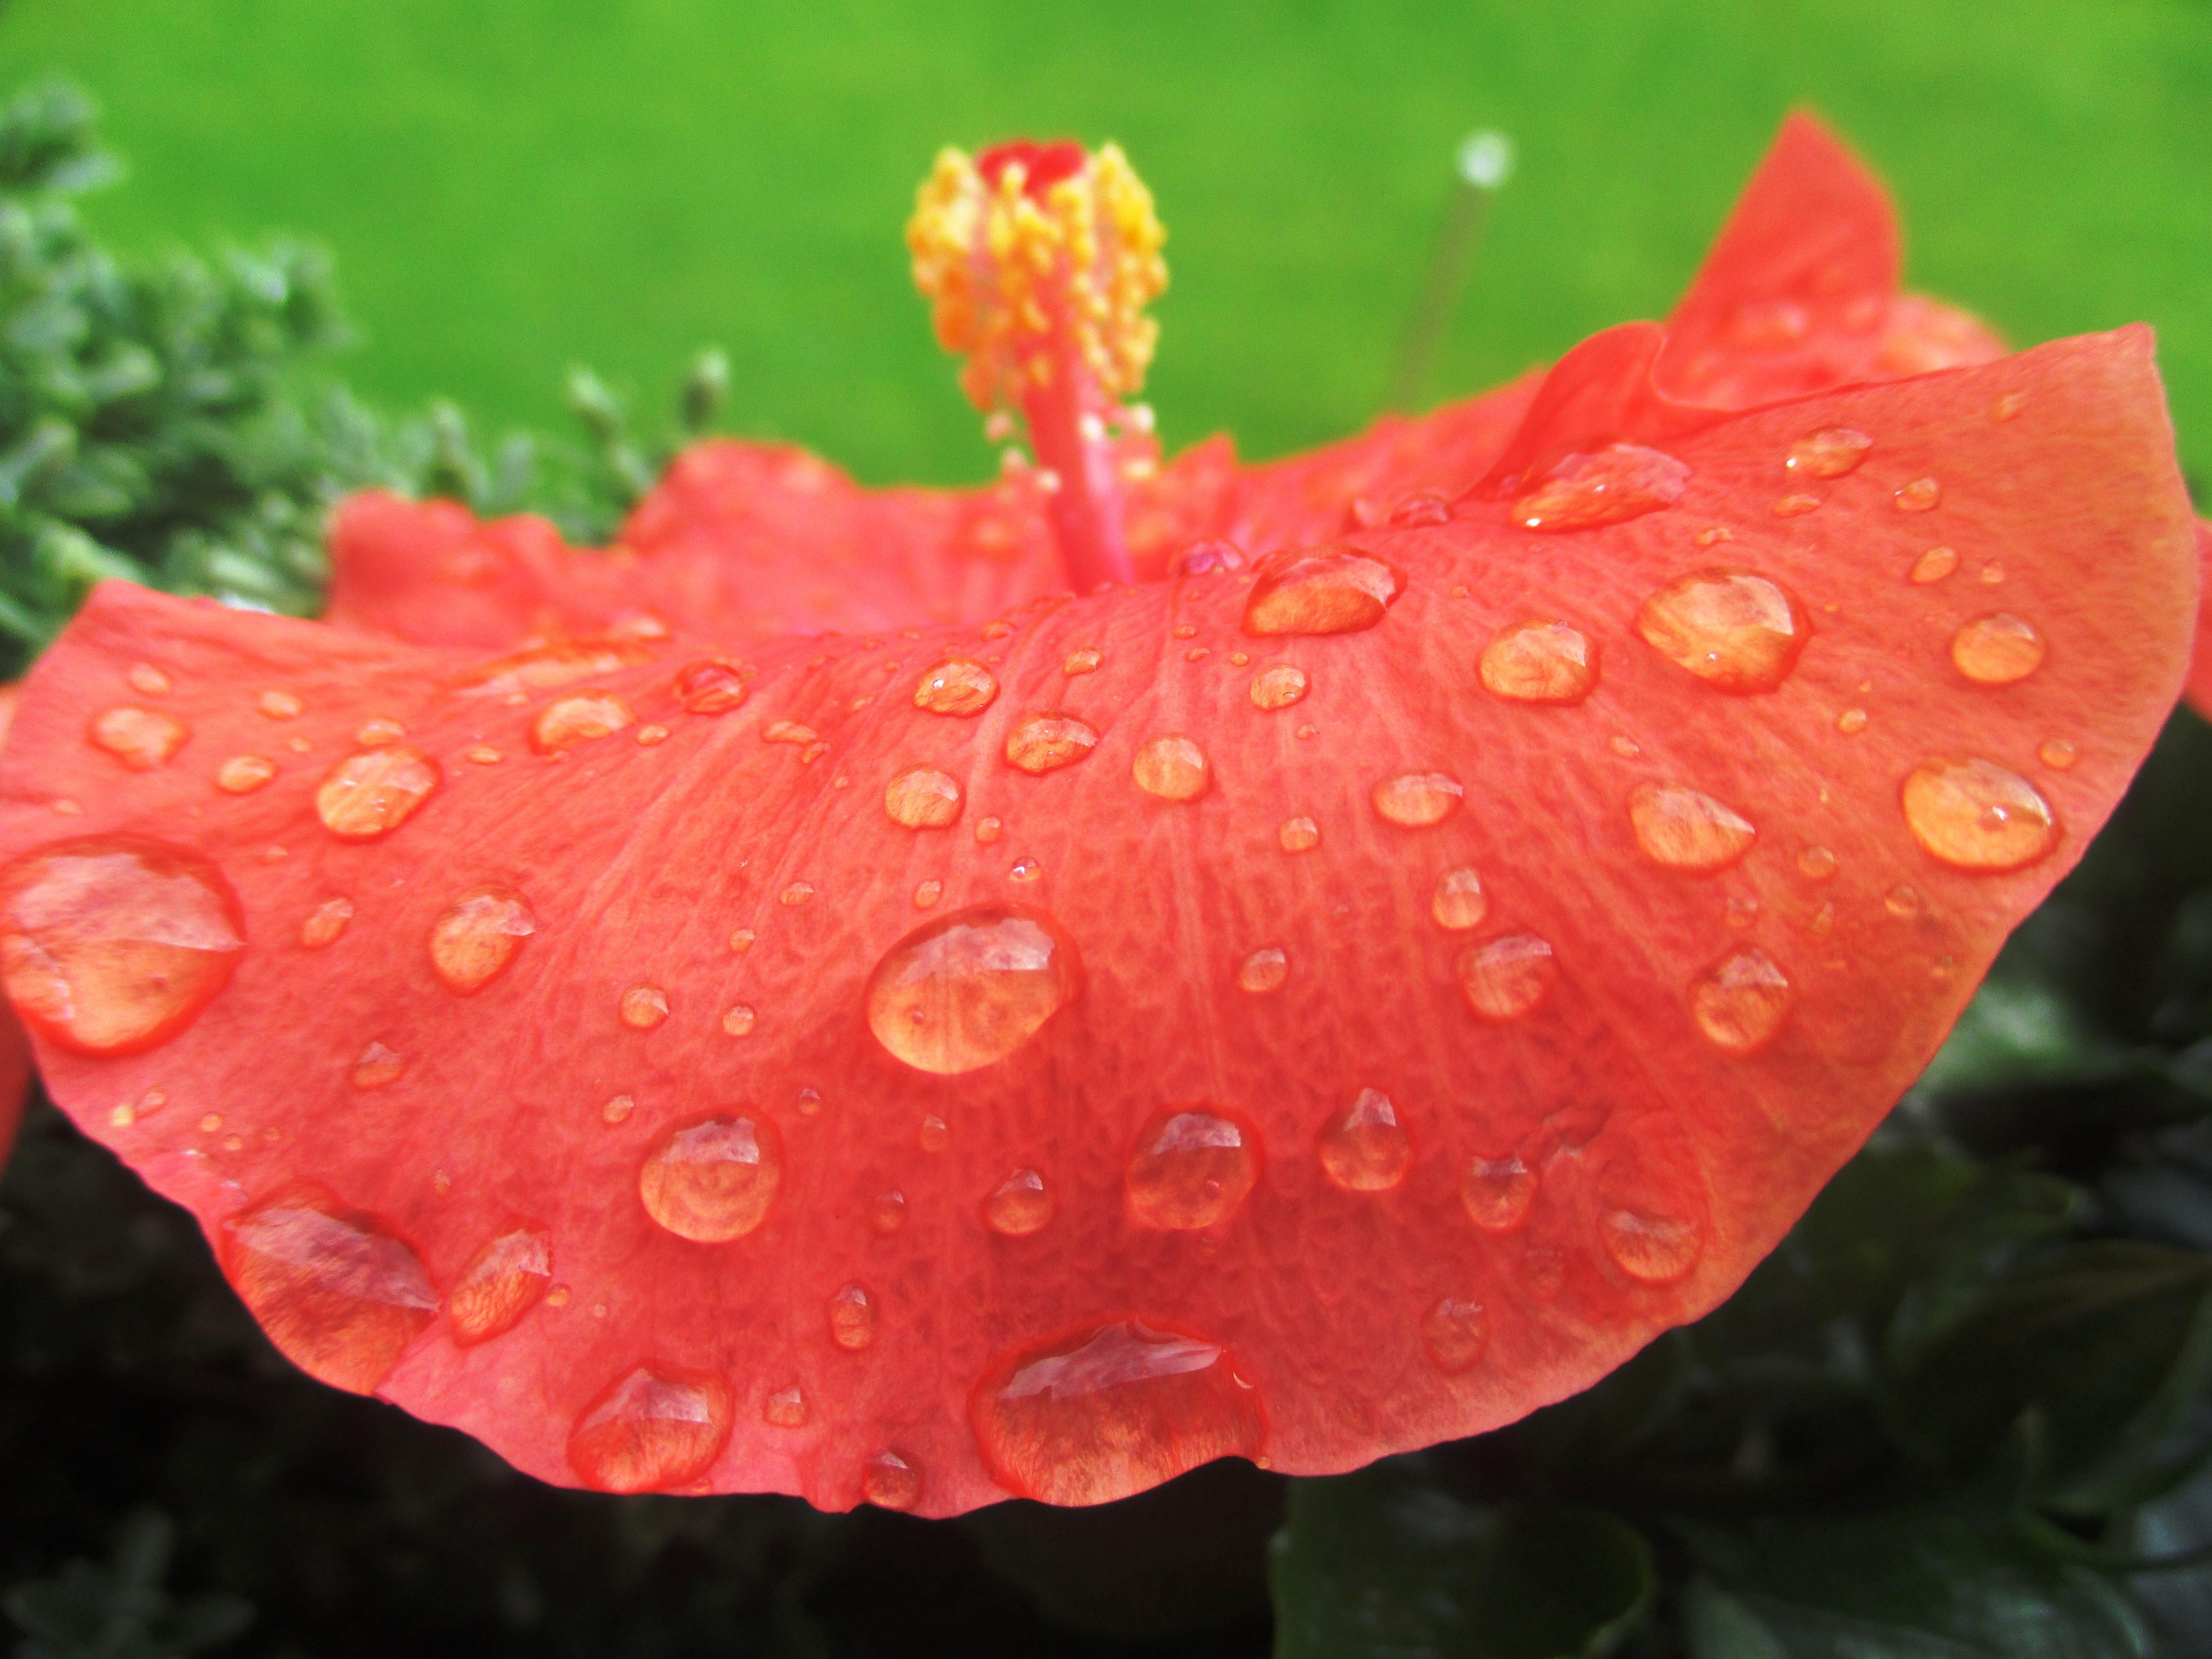 1000 beautiful hibiscus flower photos pexels free stock photos fetching more photos izmirmasajfo